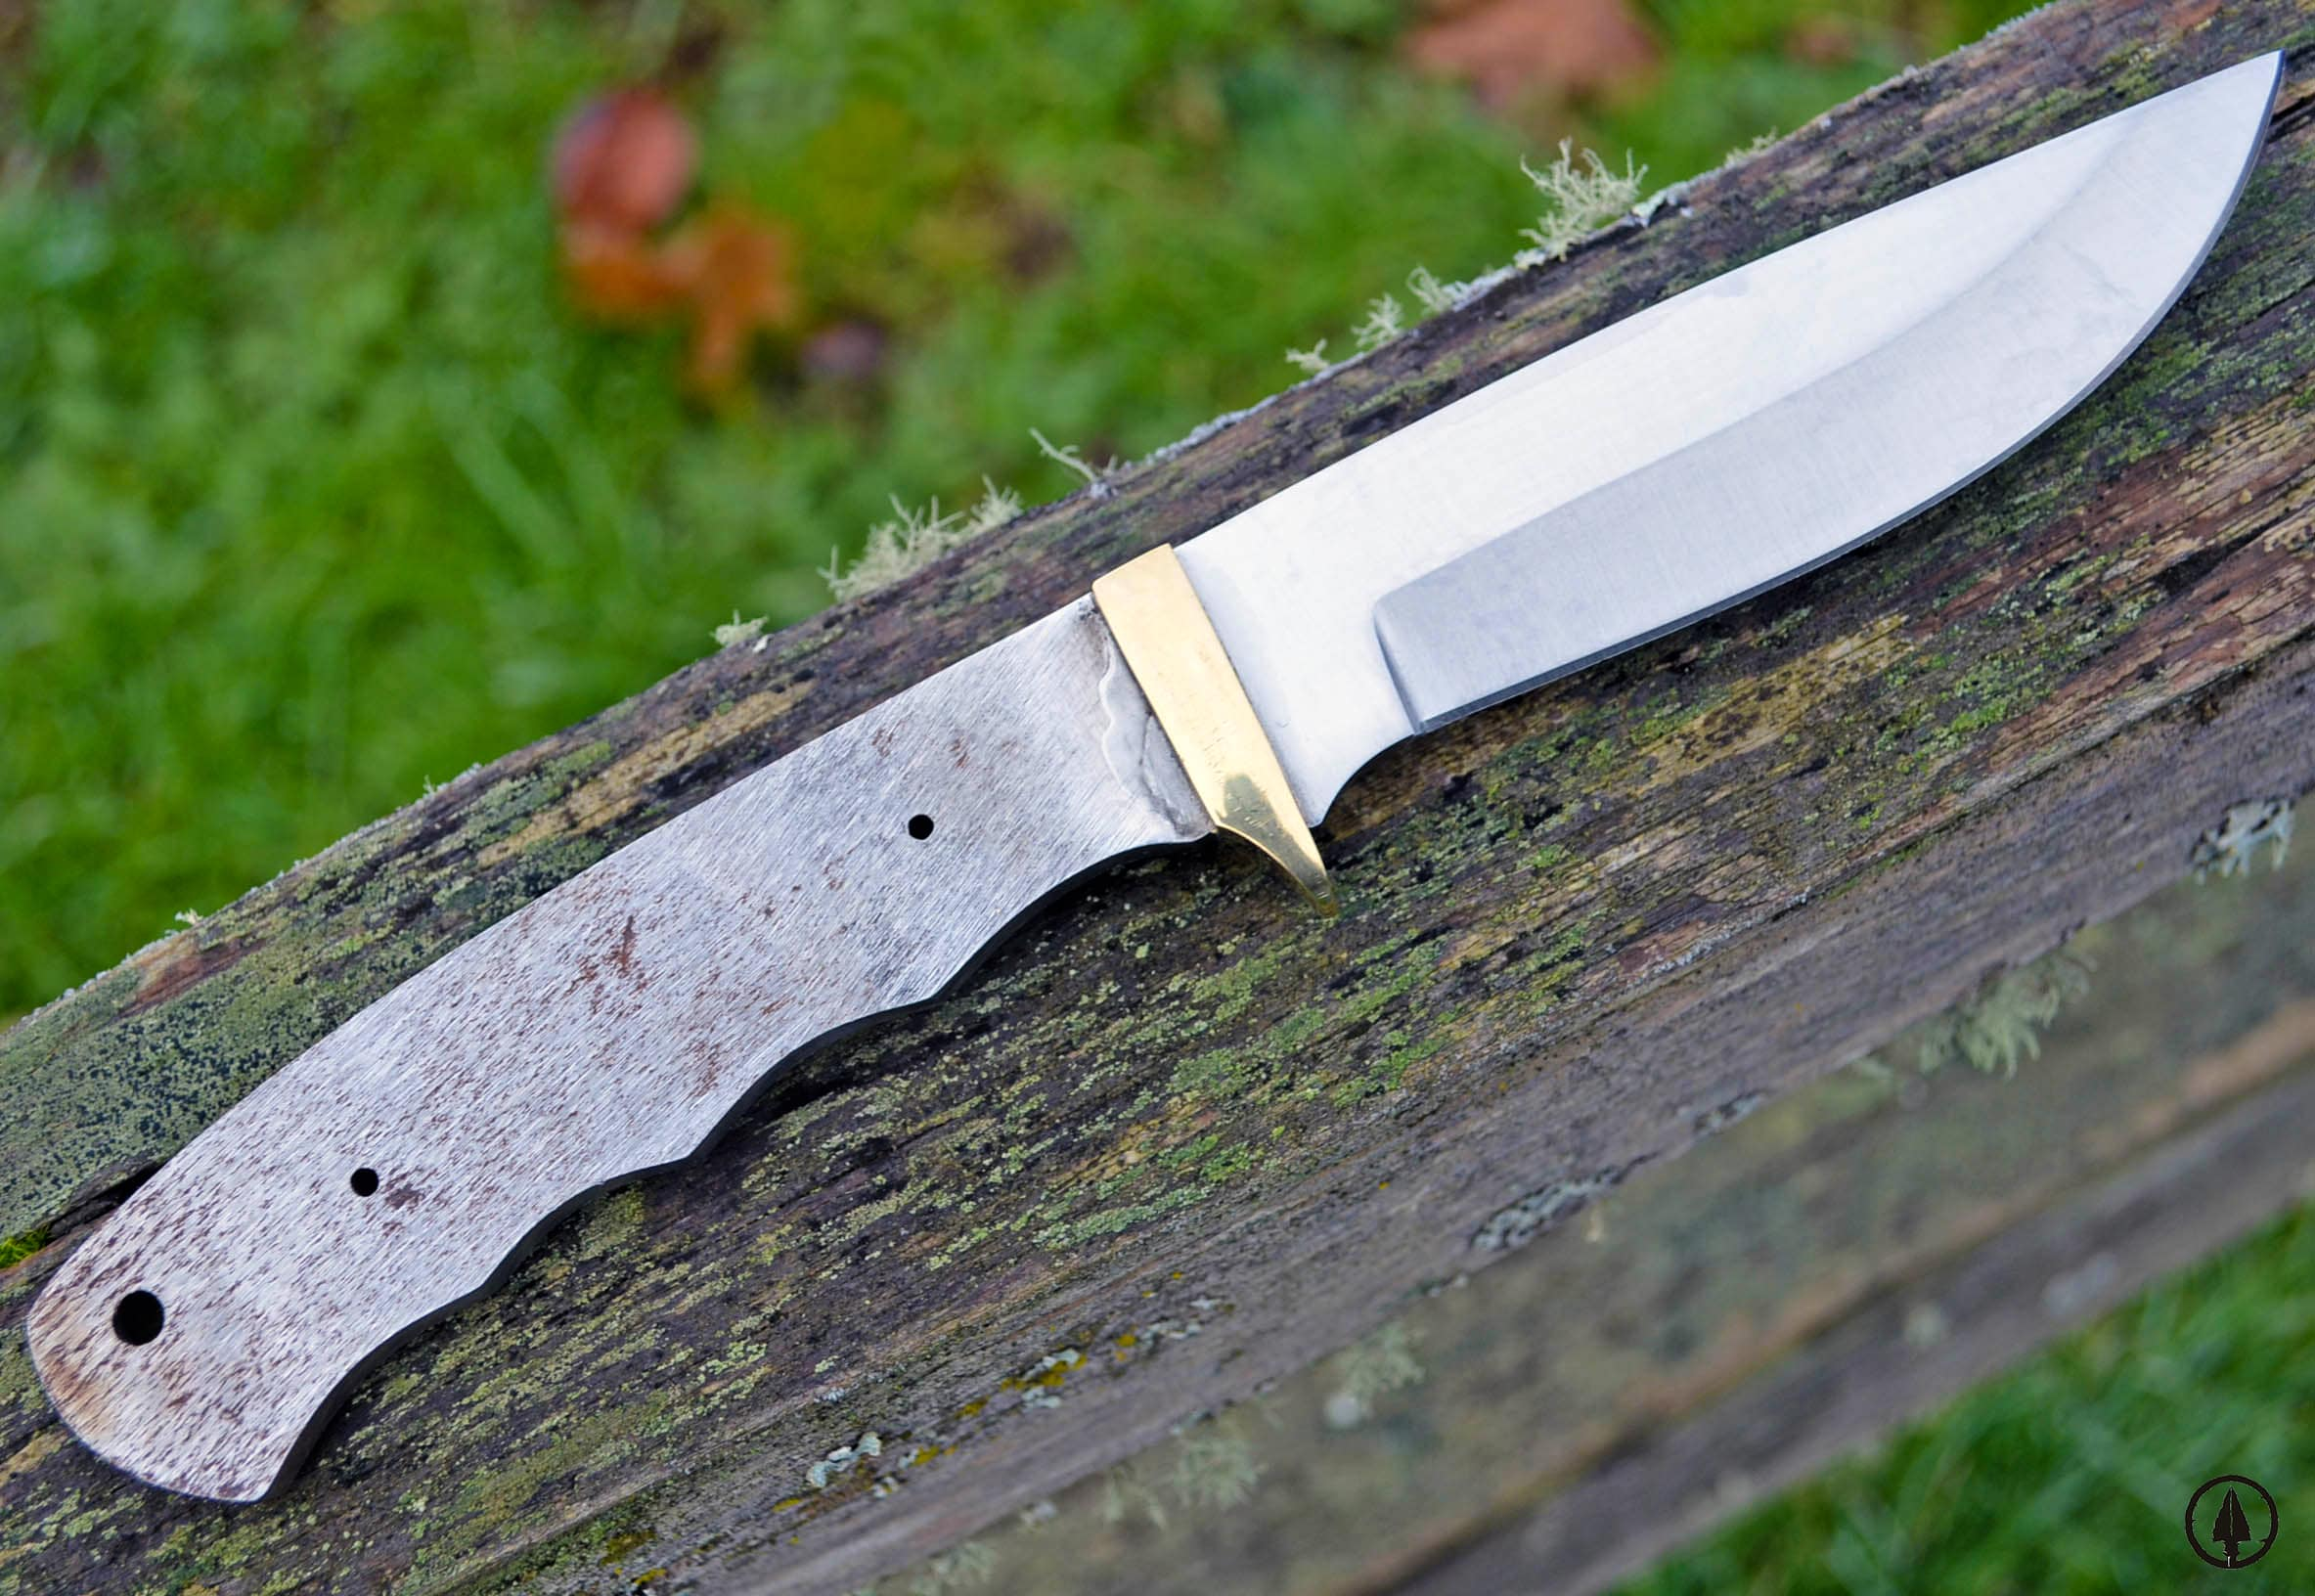 Knife blade grinds cover